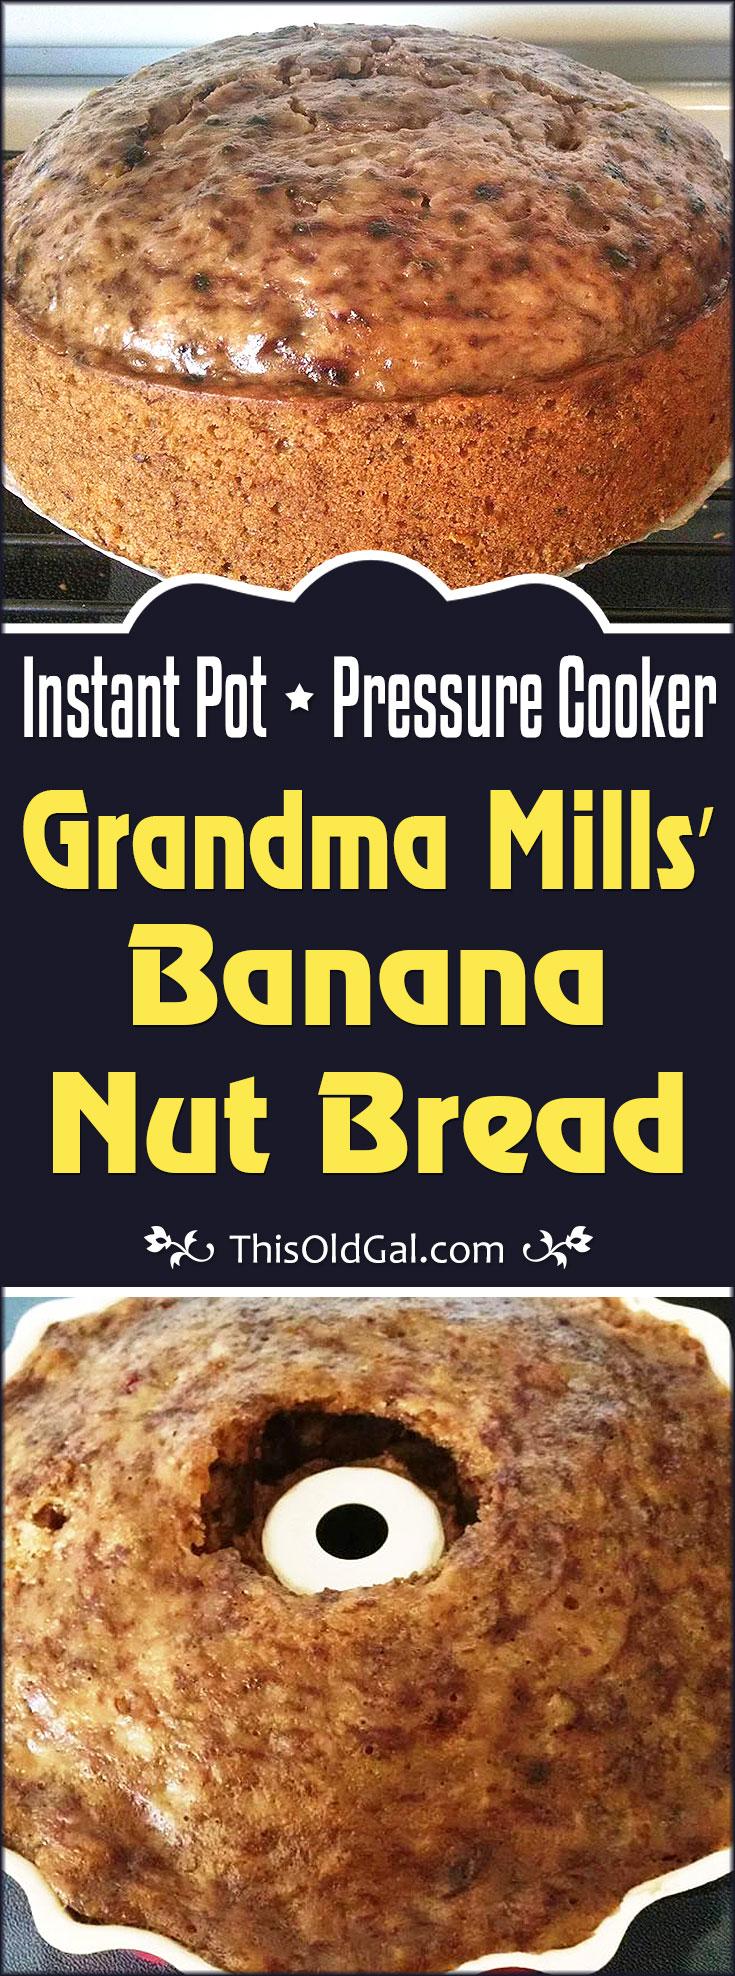 Instant Pot Pressure Cooker Grandma Mills Banana Nut Bread